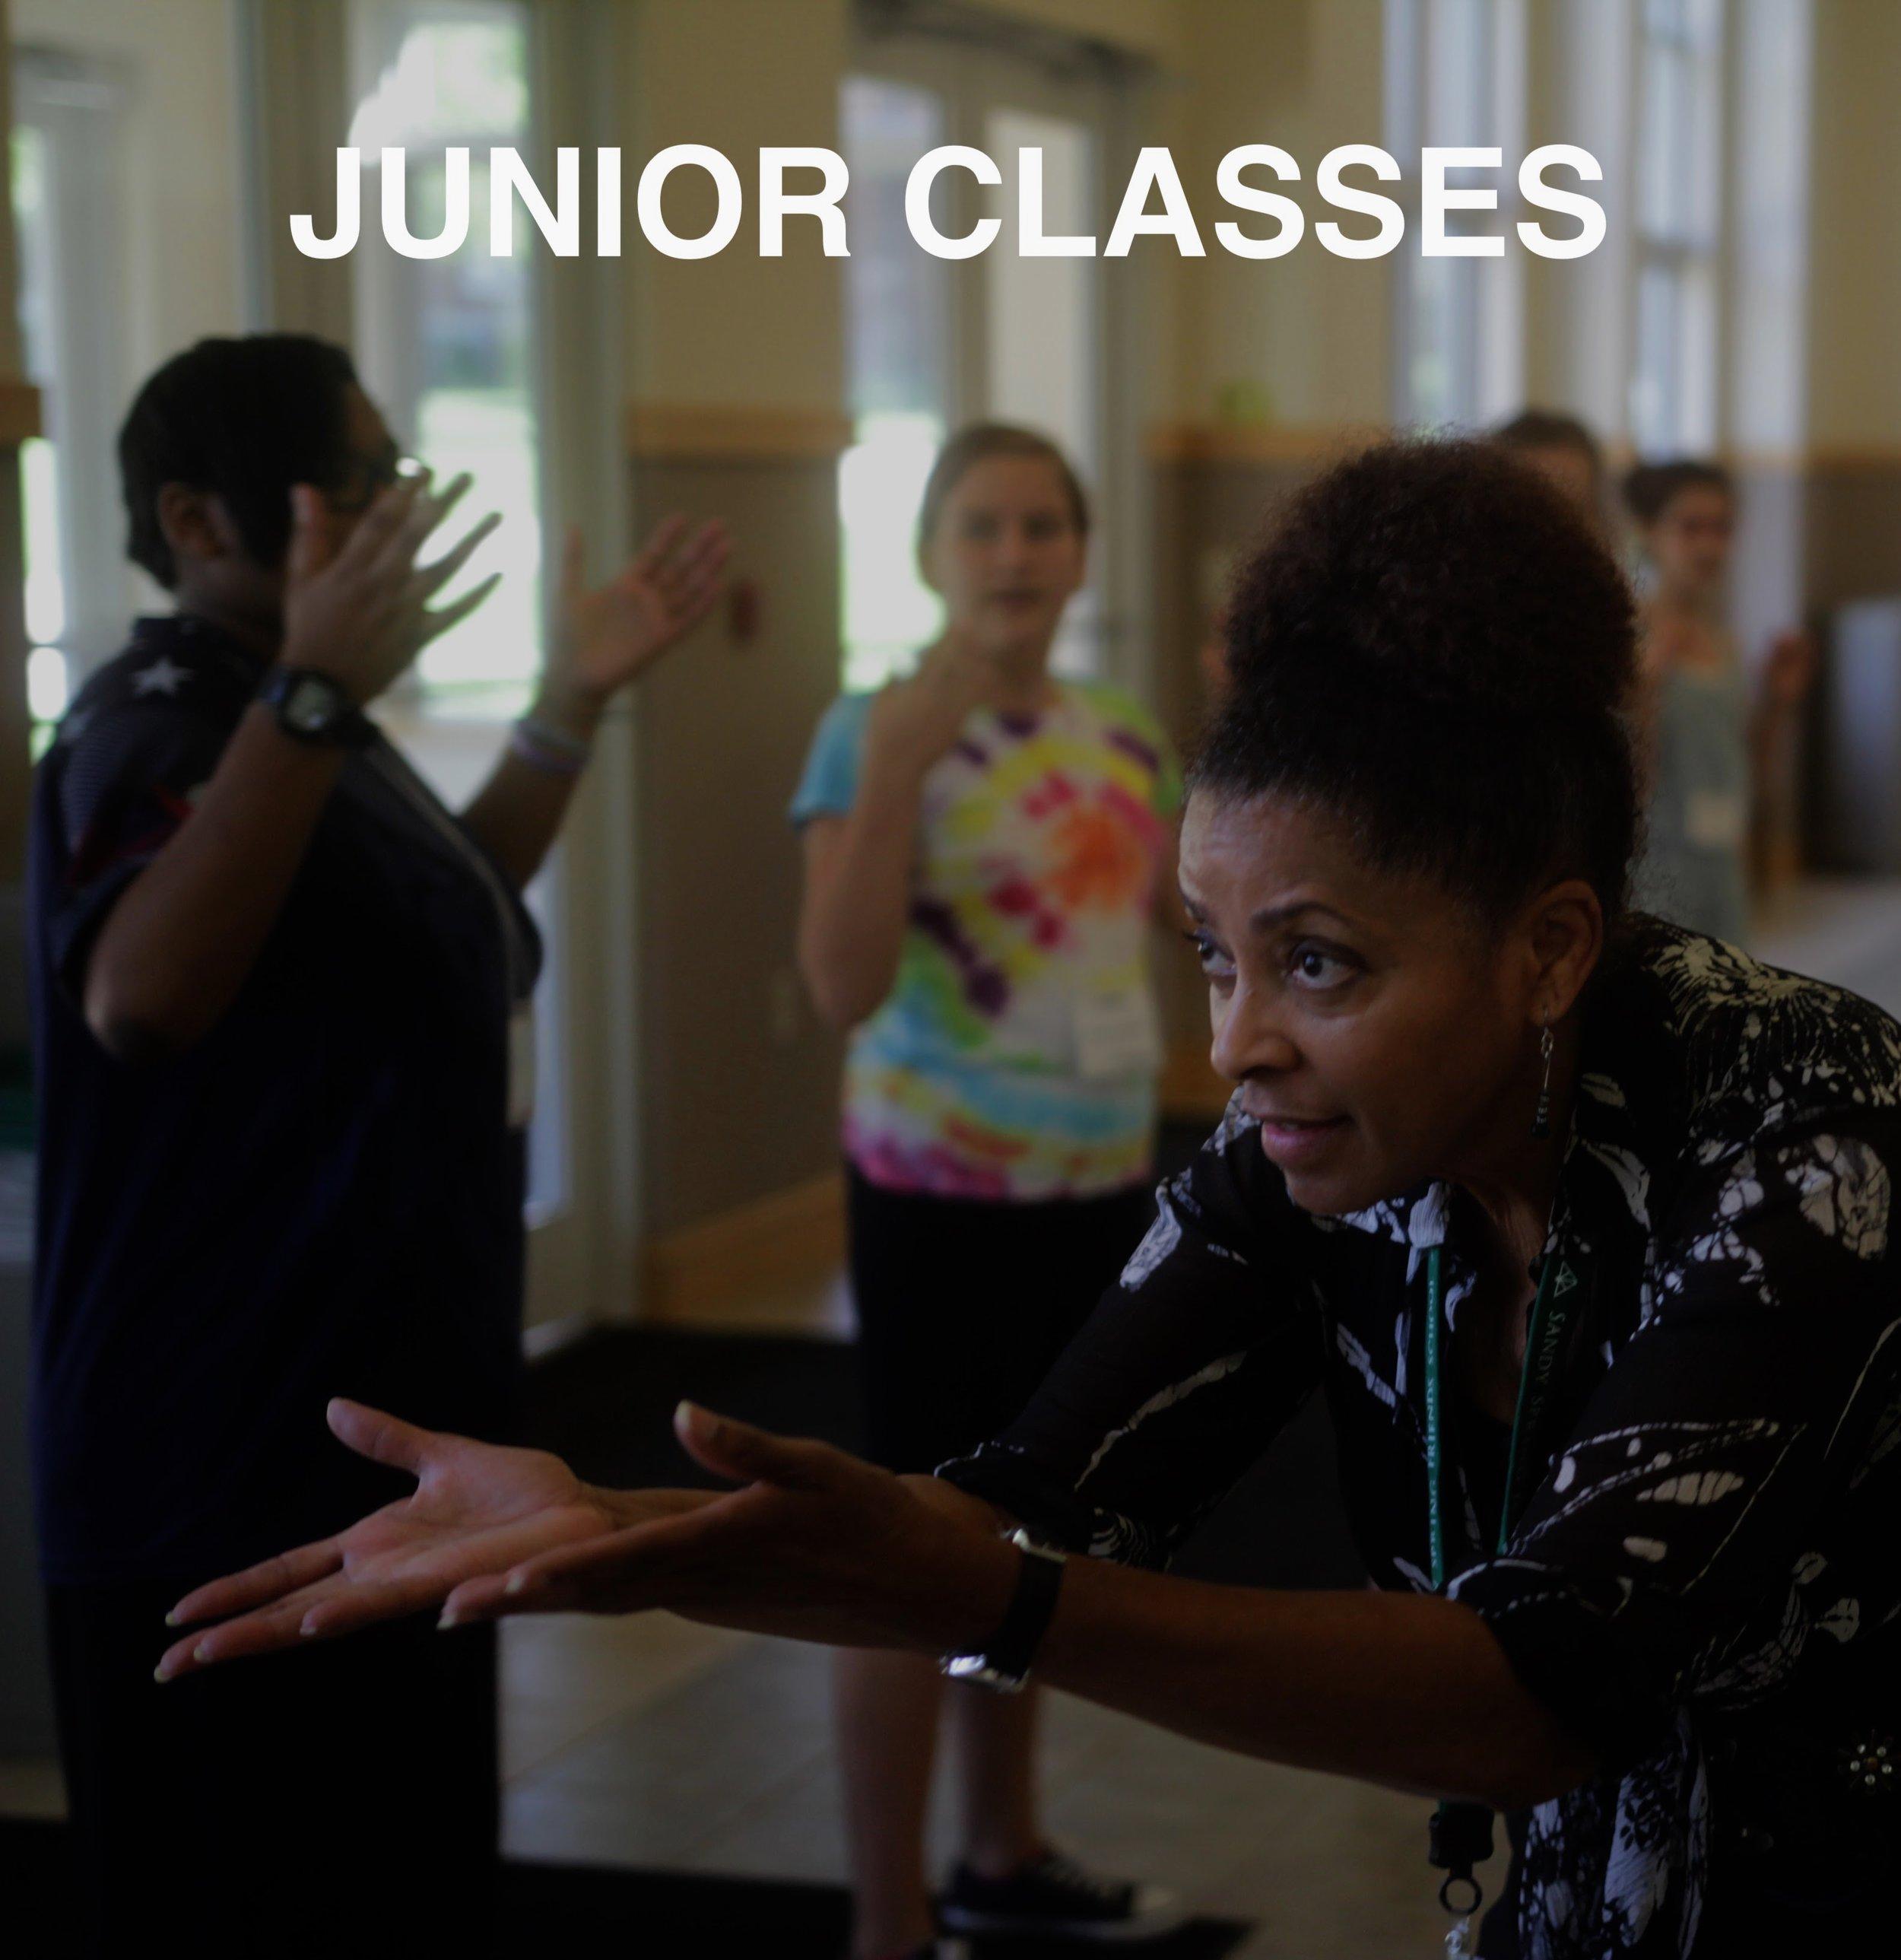 Junior Classes LOGO.jpg